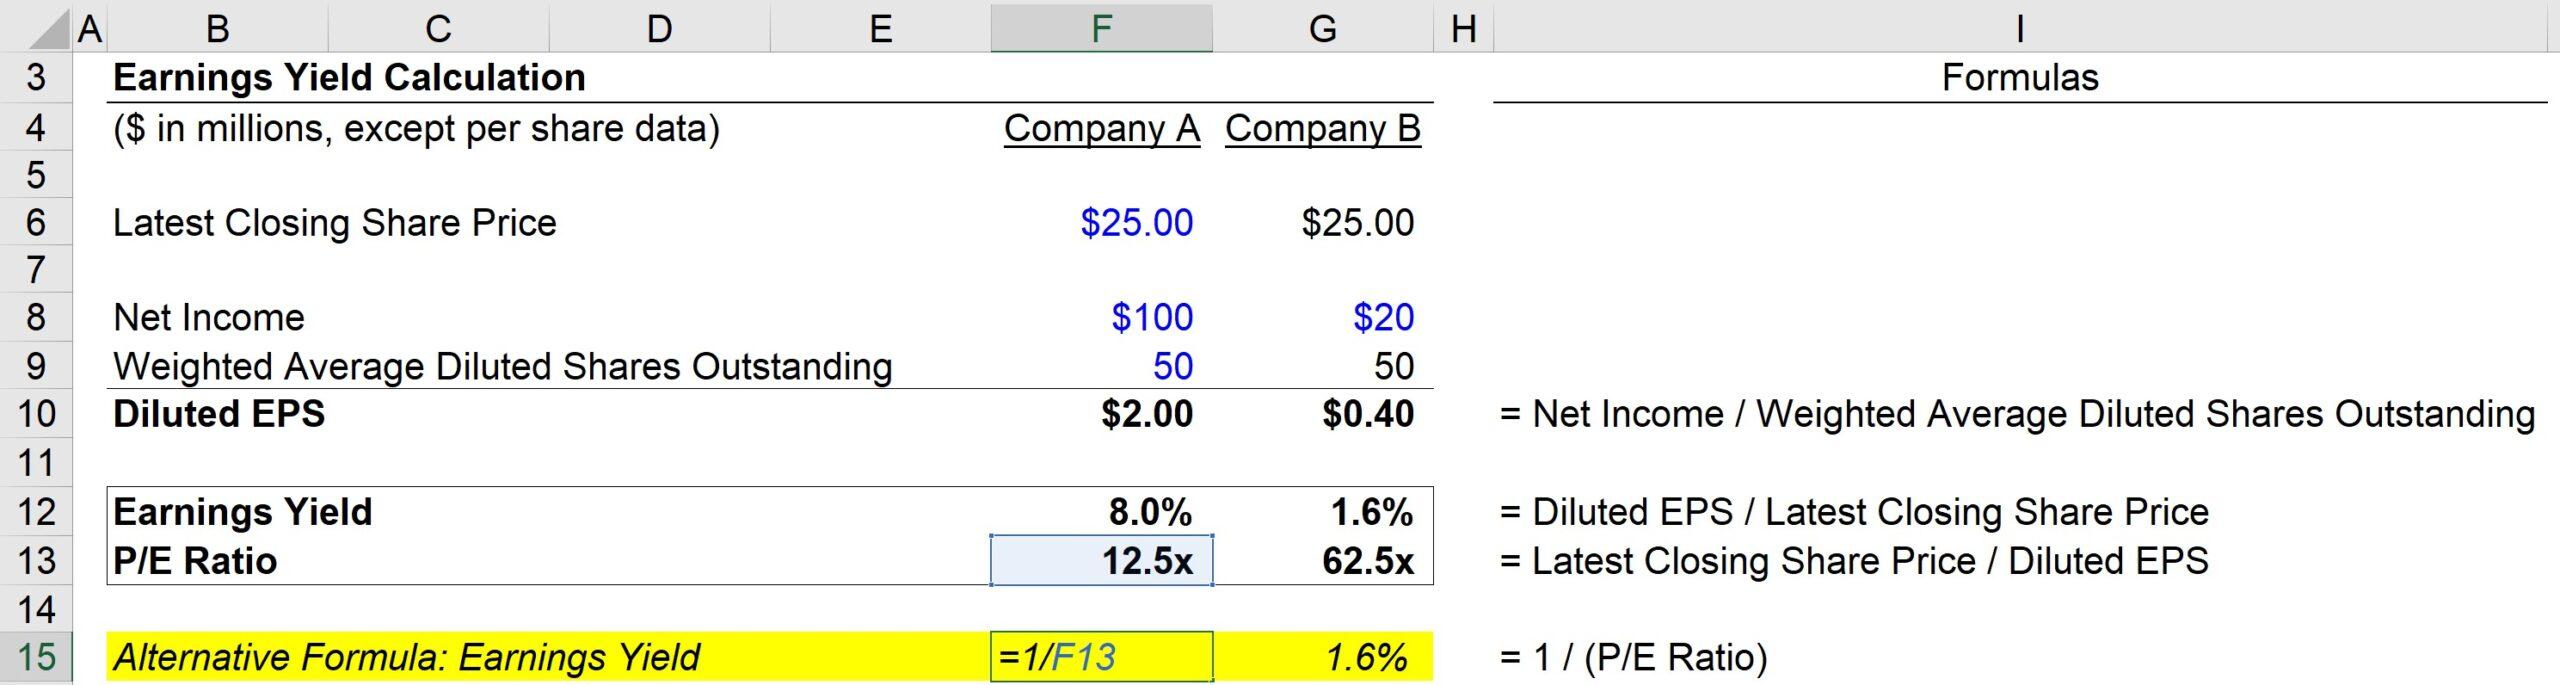 Earnings Yield Formula Excel 2